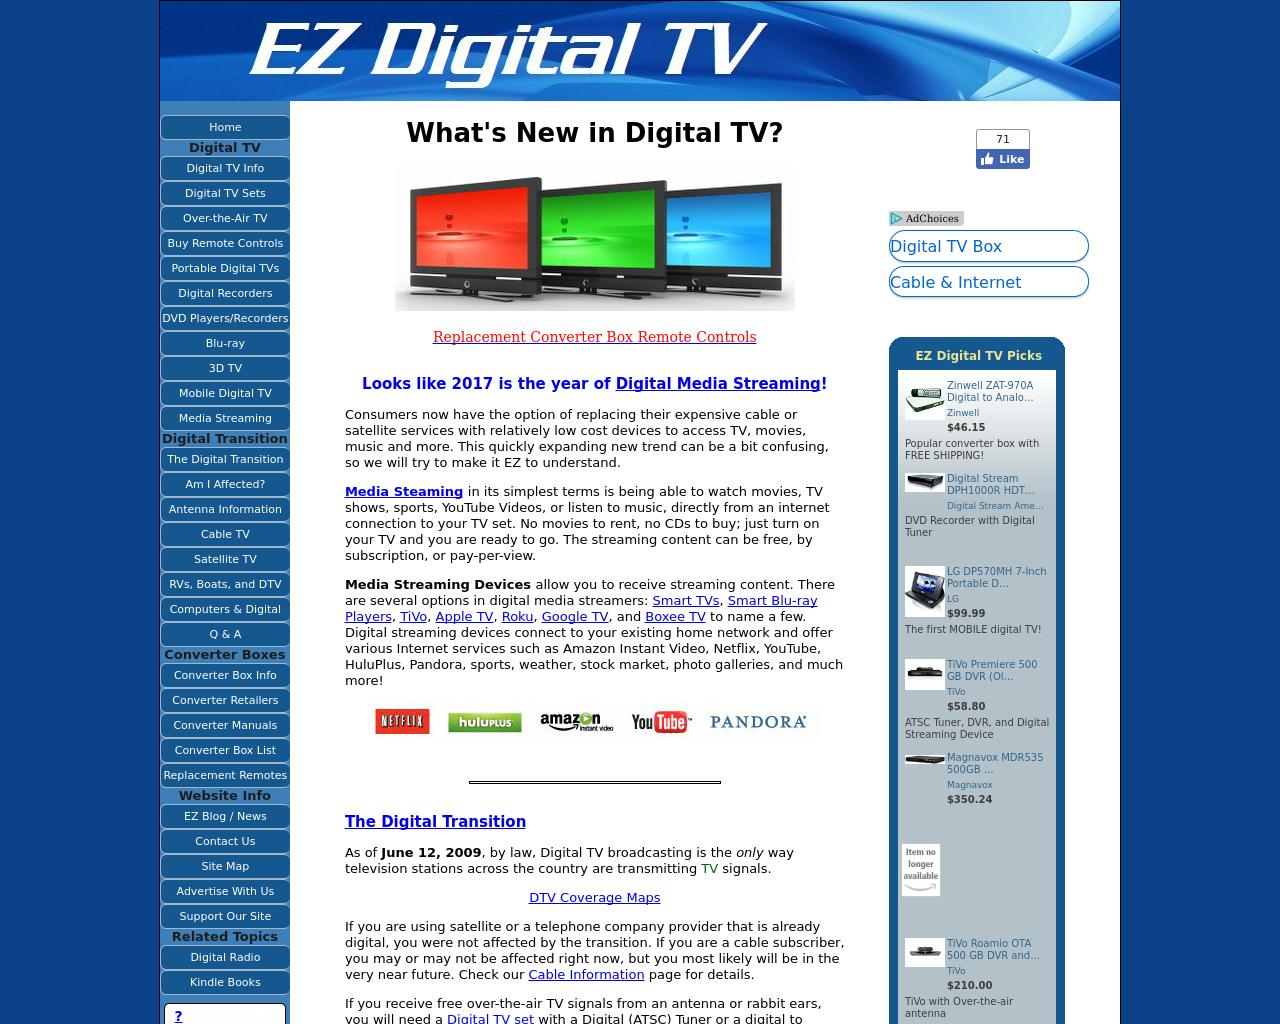 Ez-Digital-Tv-Advertising-Reviews-Pricing